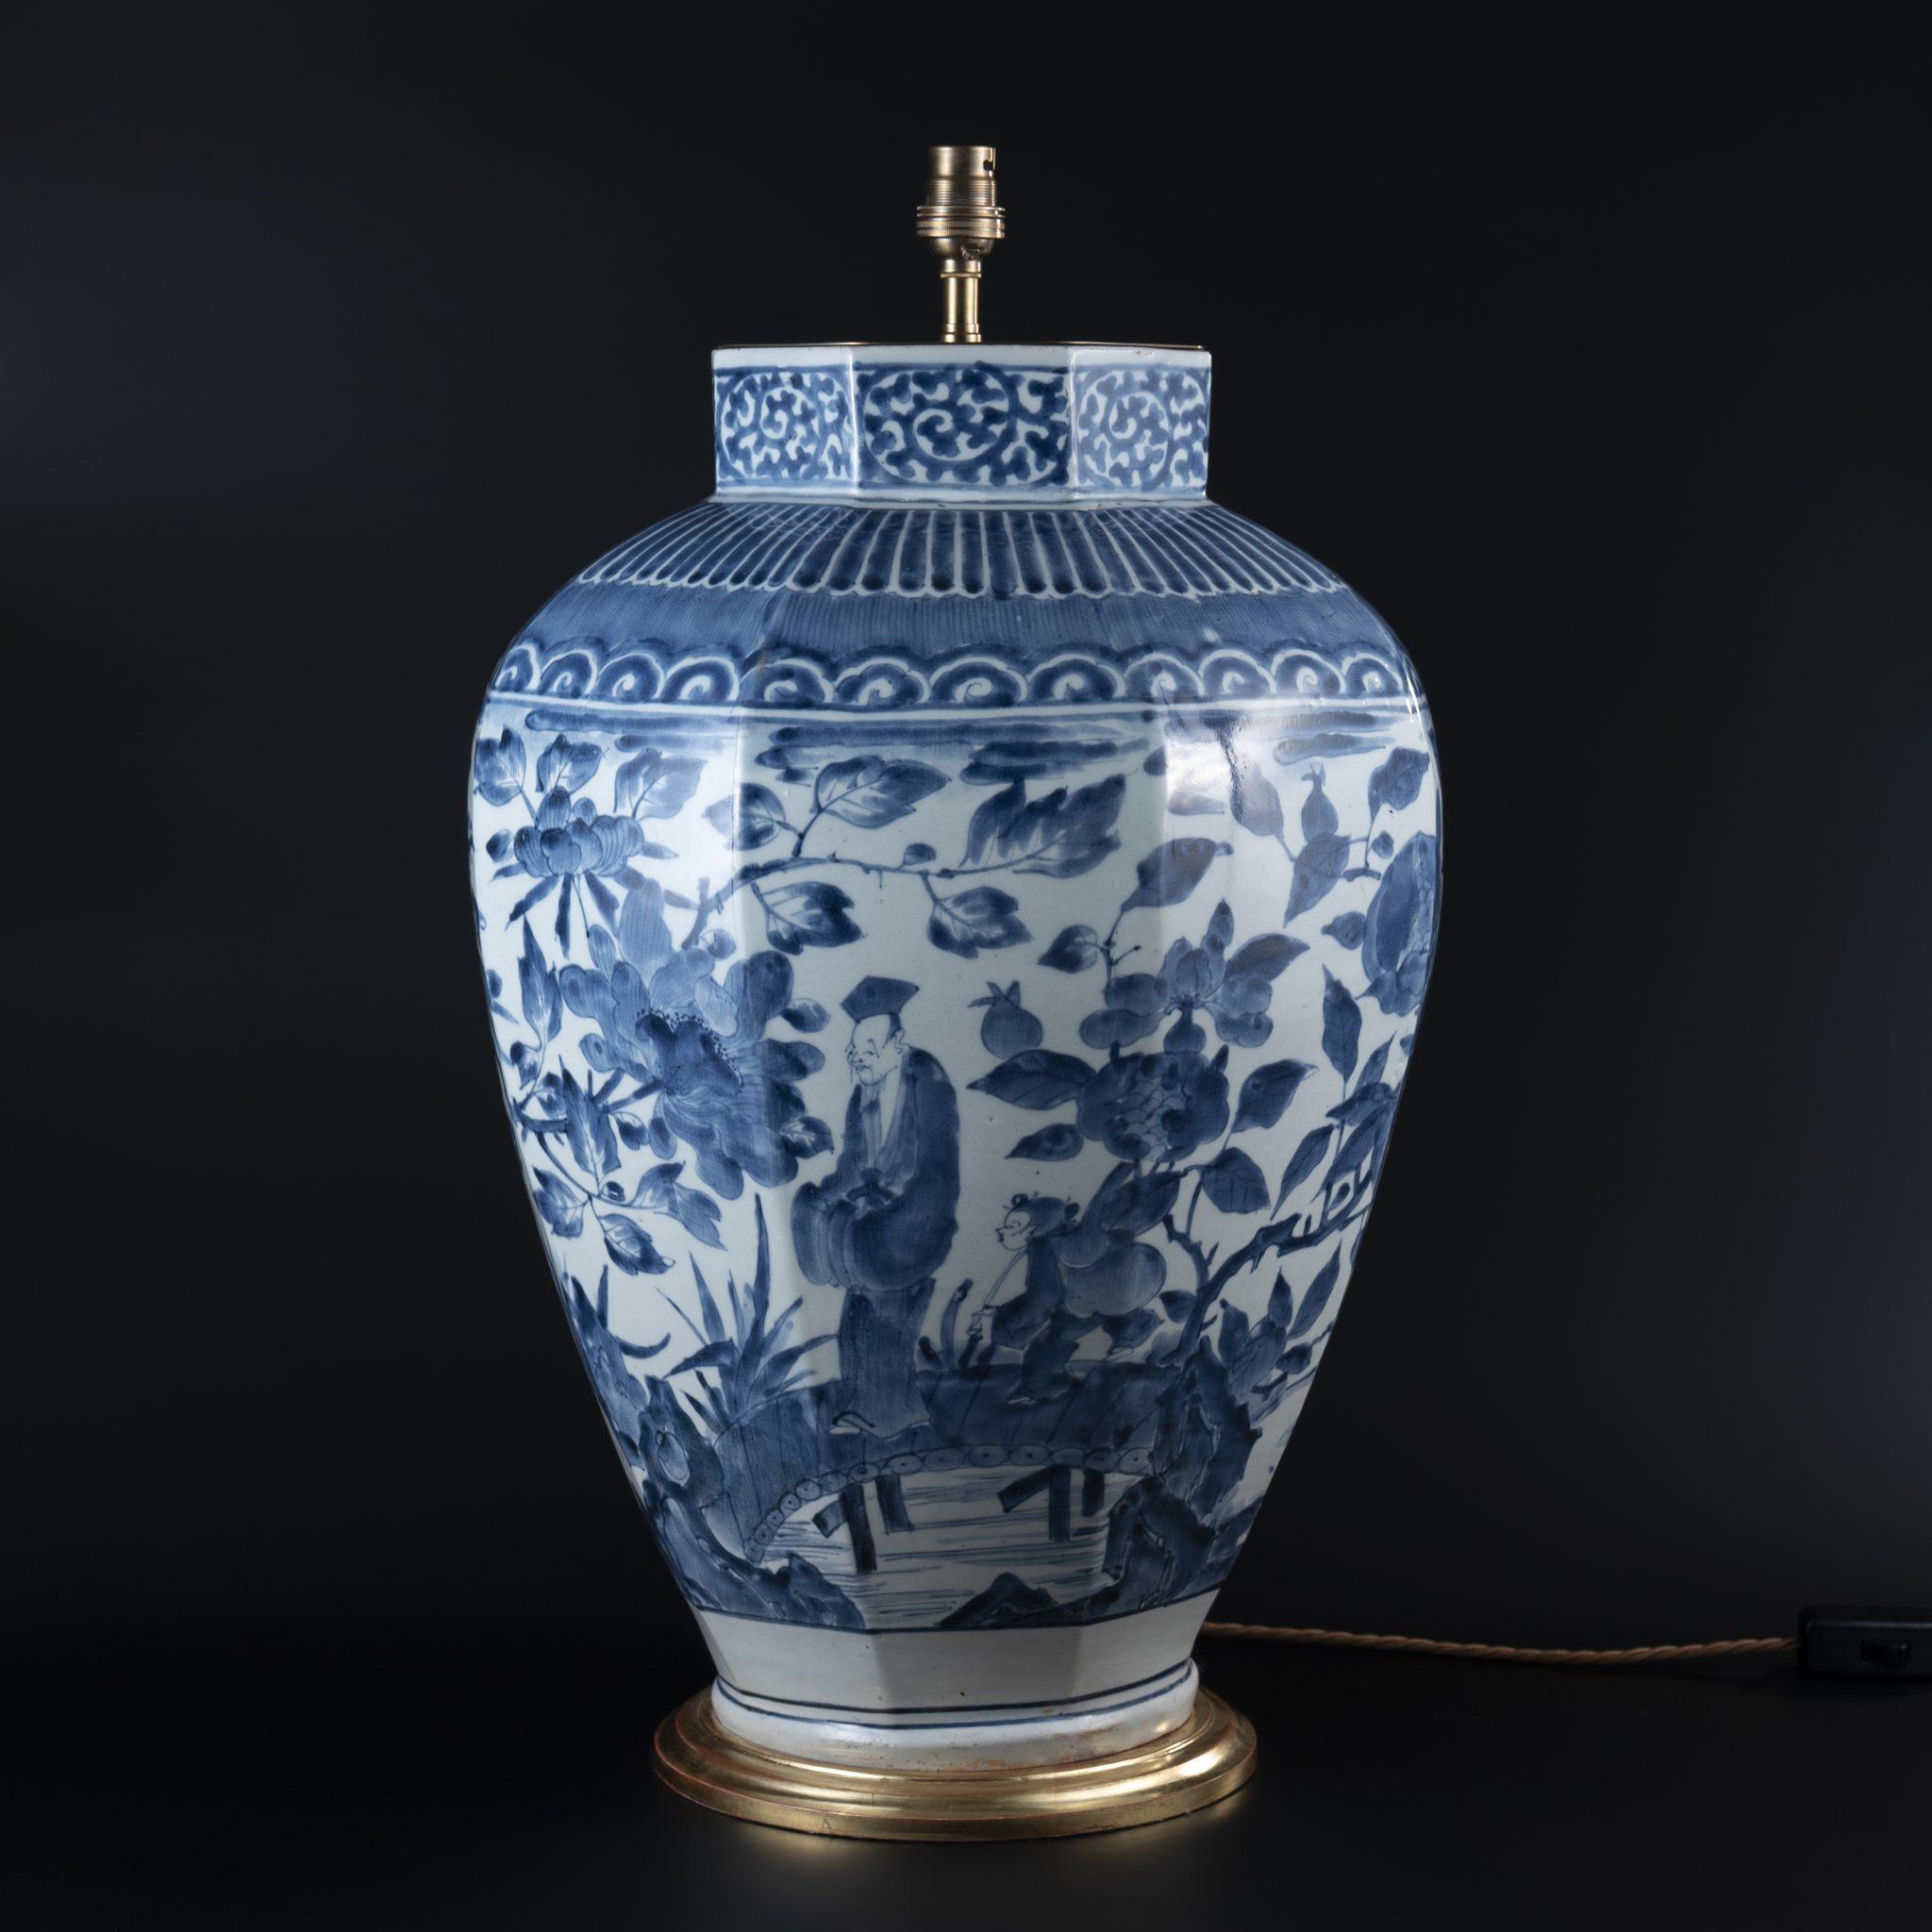 Large Japanese Arita Octagonal Porcelain Vase as a Lamp, circa 1700